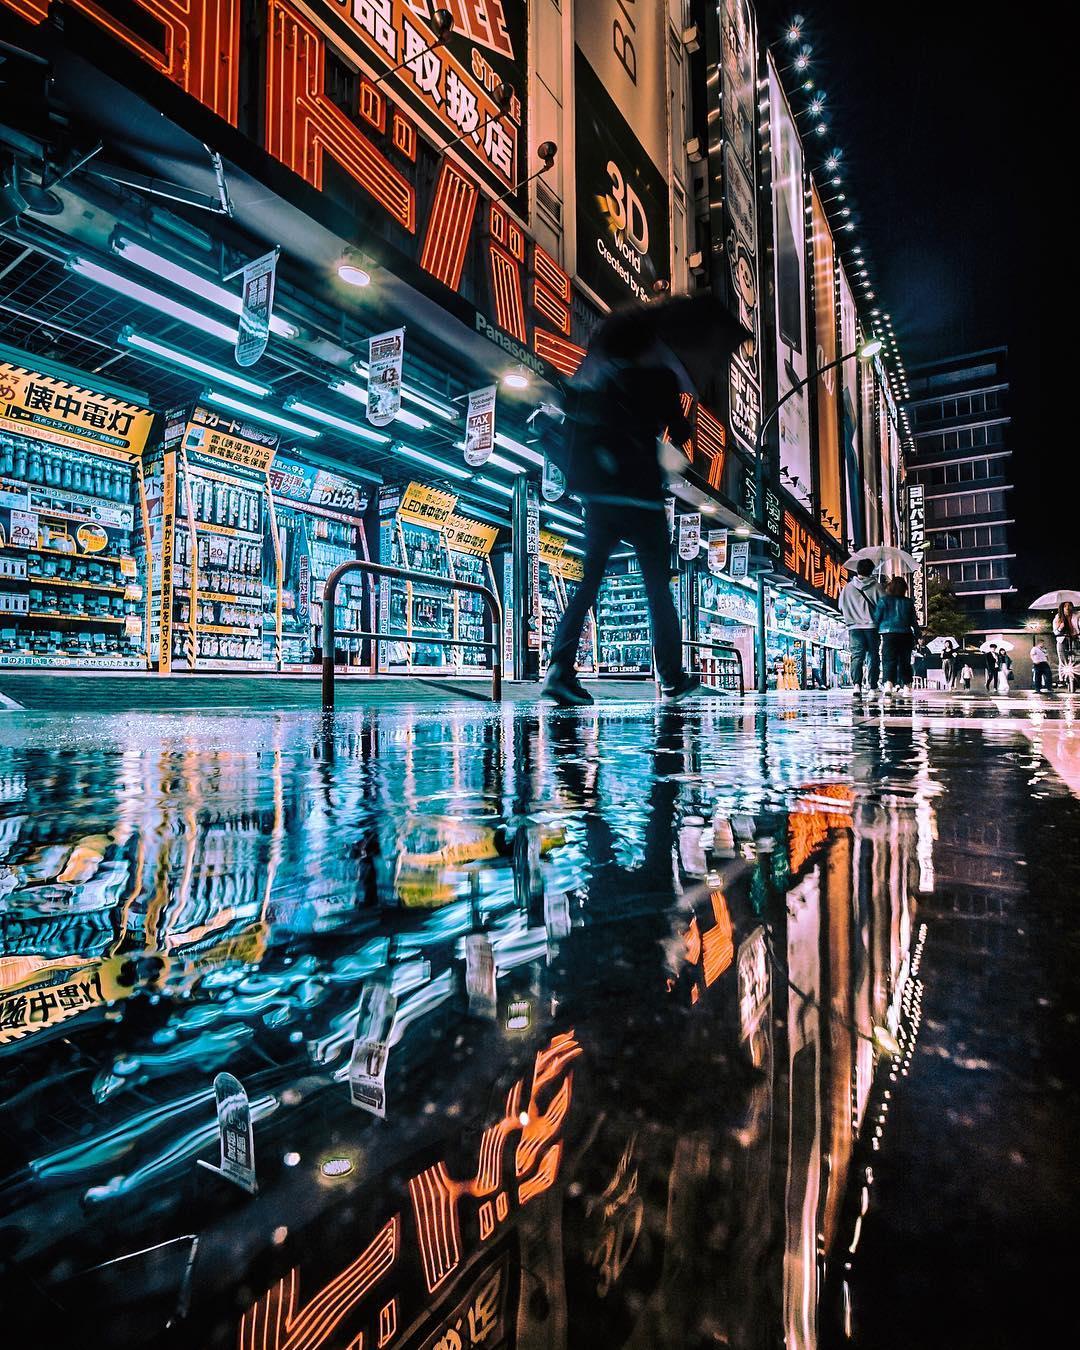 tokyo-nightlife-photography-hosokawa-ryohei-2